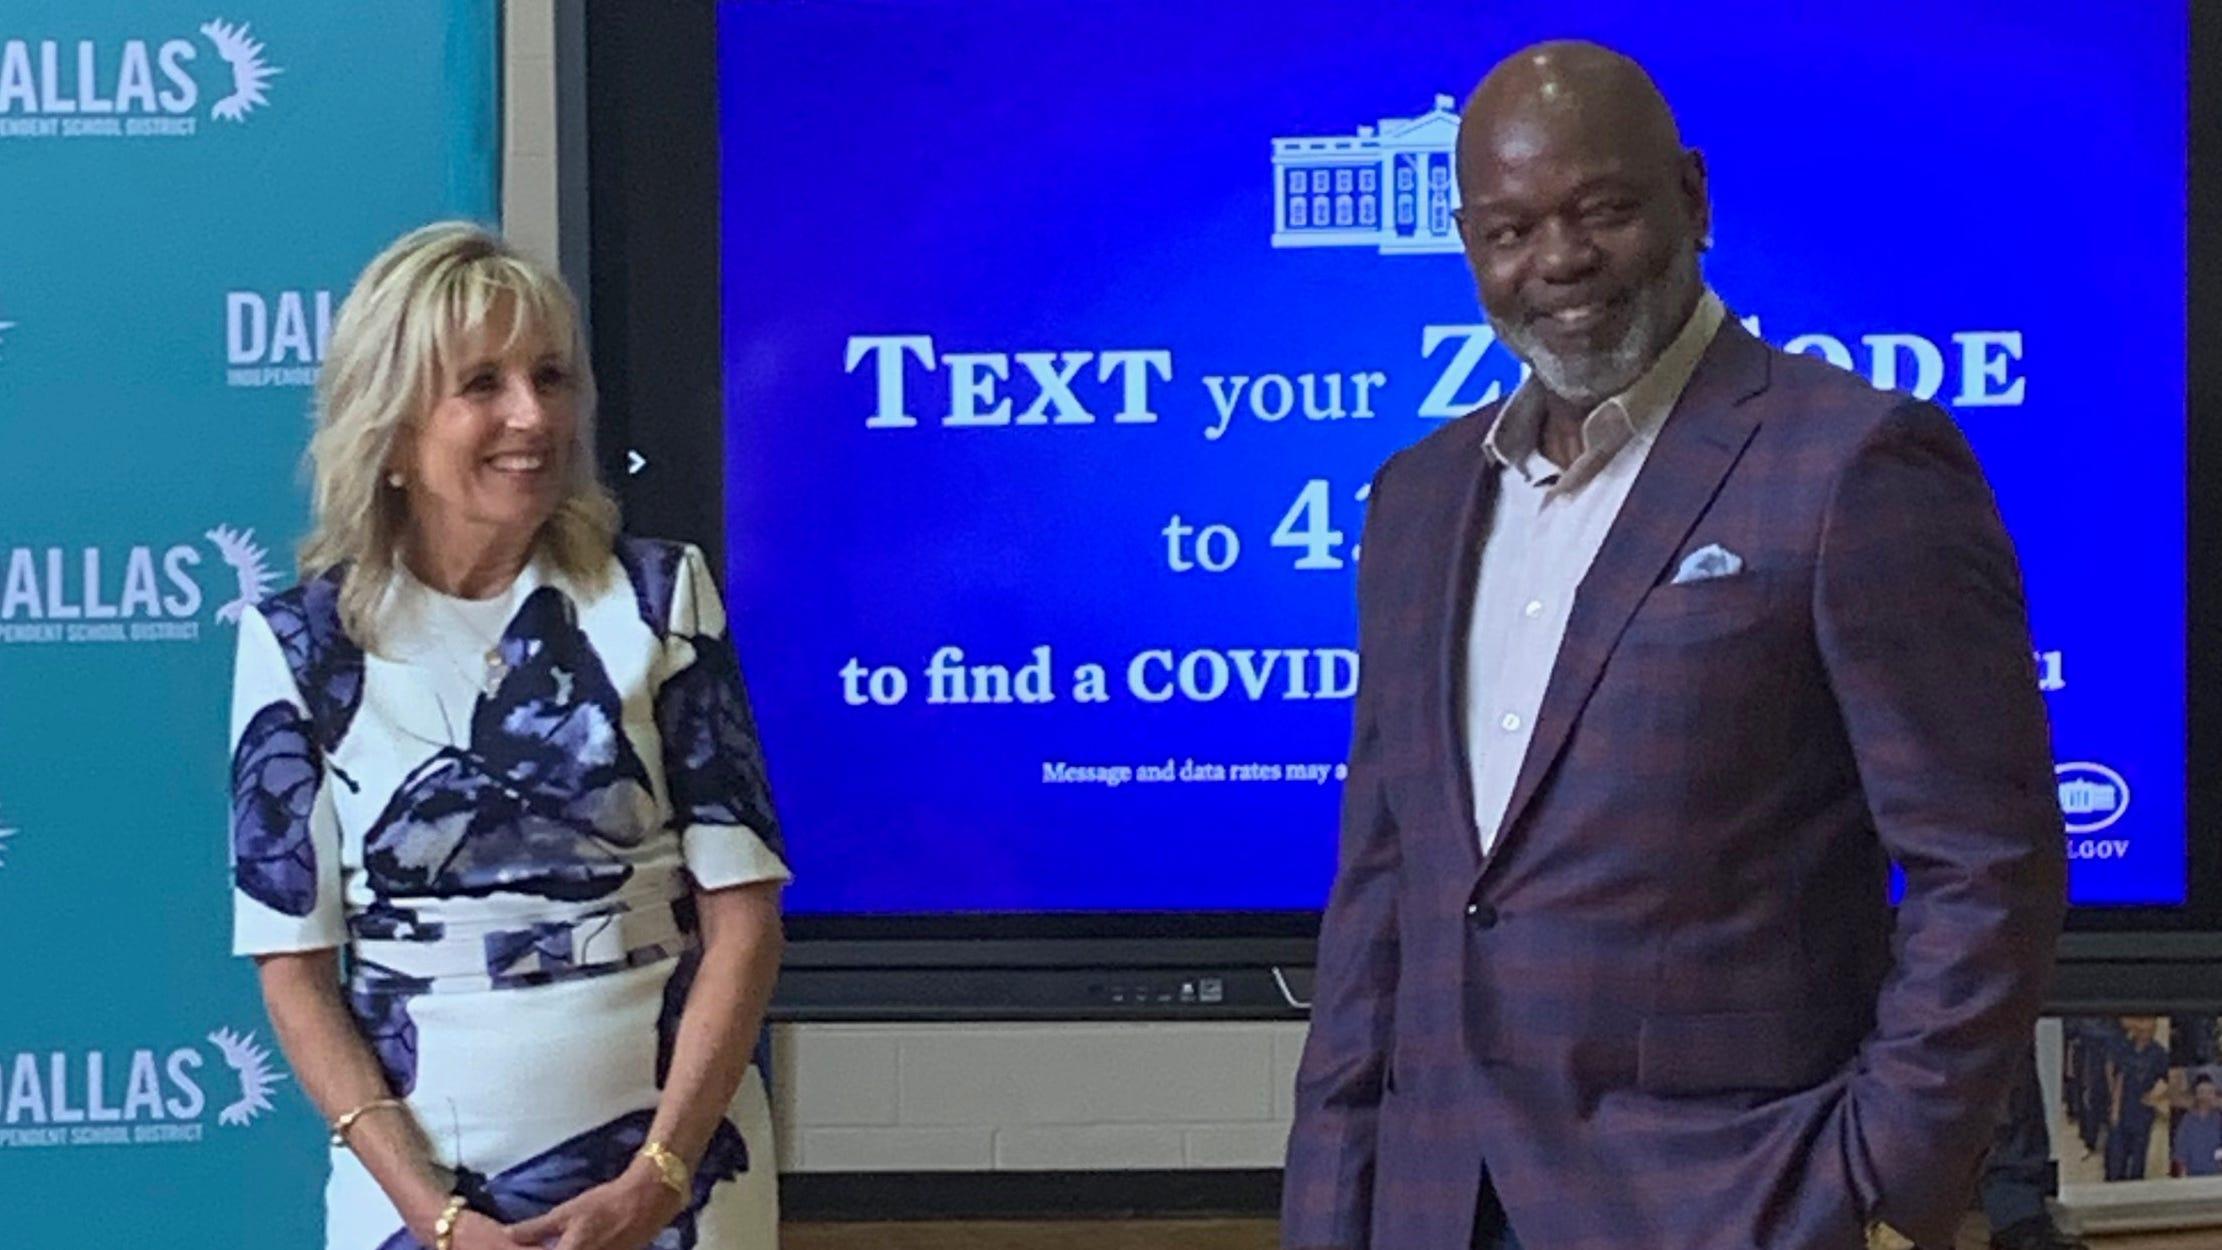 First Lady Jill Biden and Cowboys Hall of Famer Emmitt Smith talk to those assembled at Emmett J. Conrad High in Dallas.